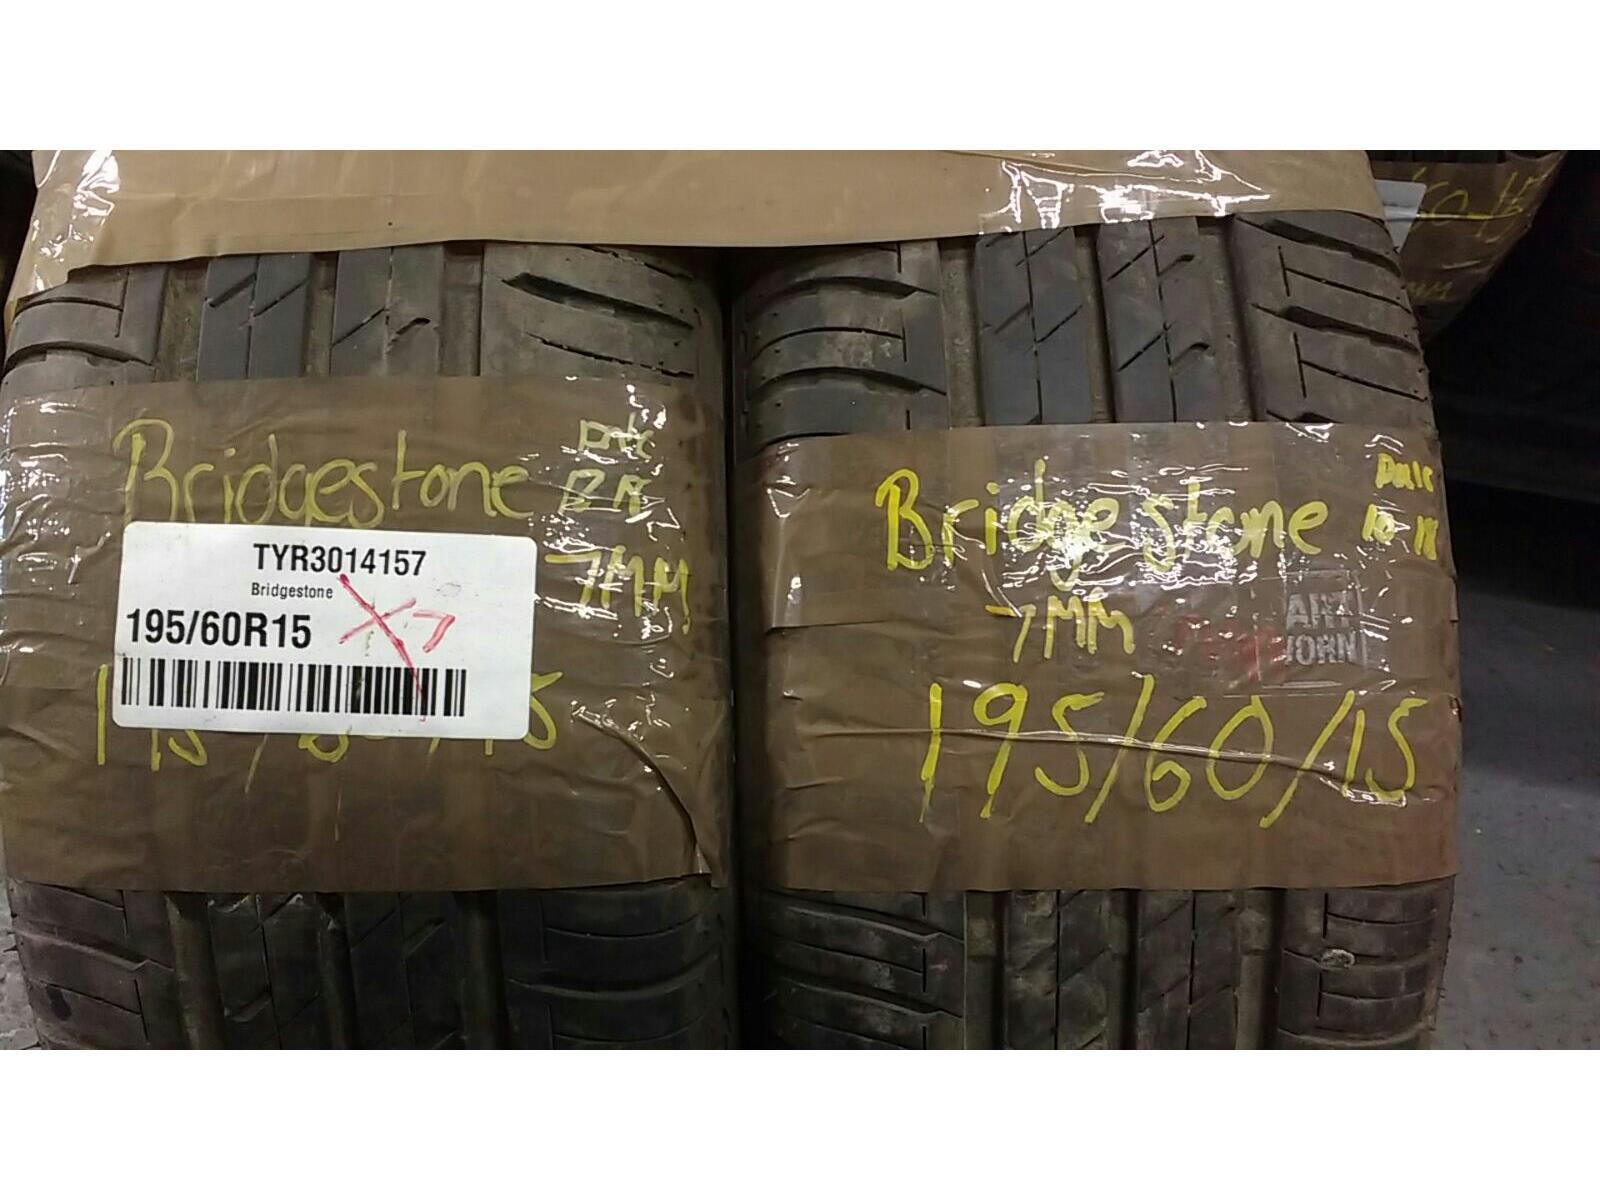 Bridgestone 195/60R15